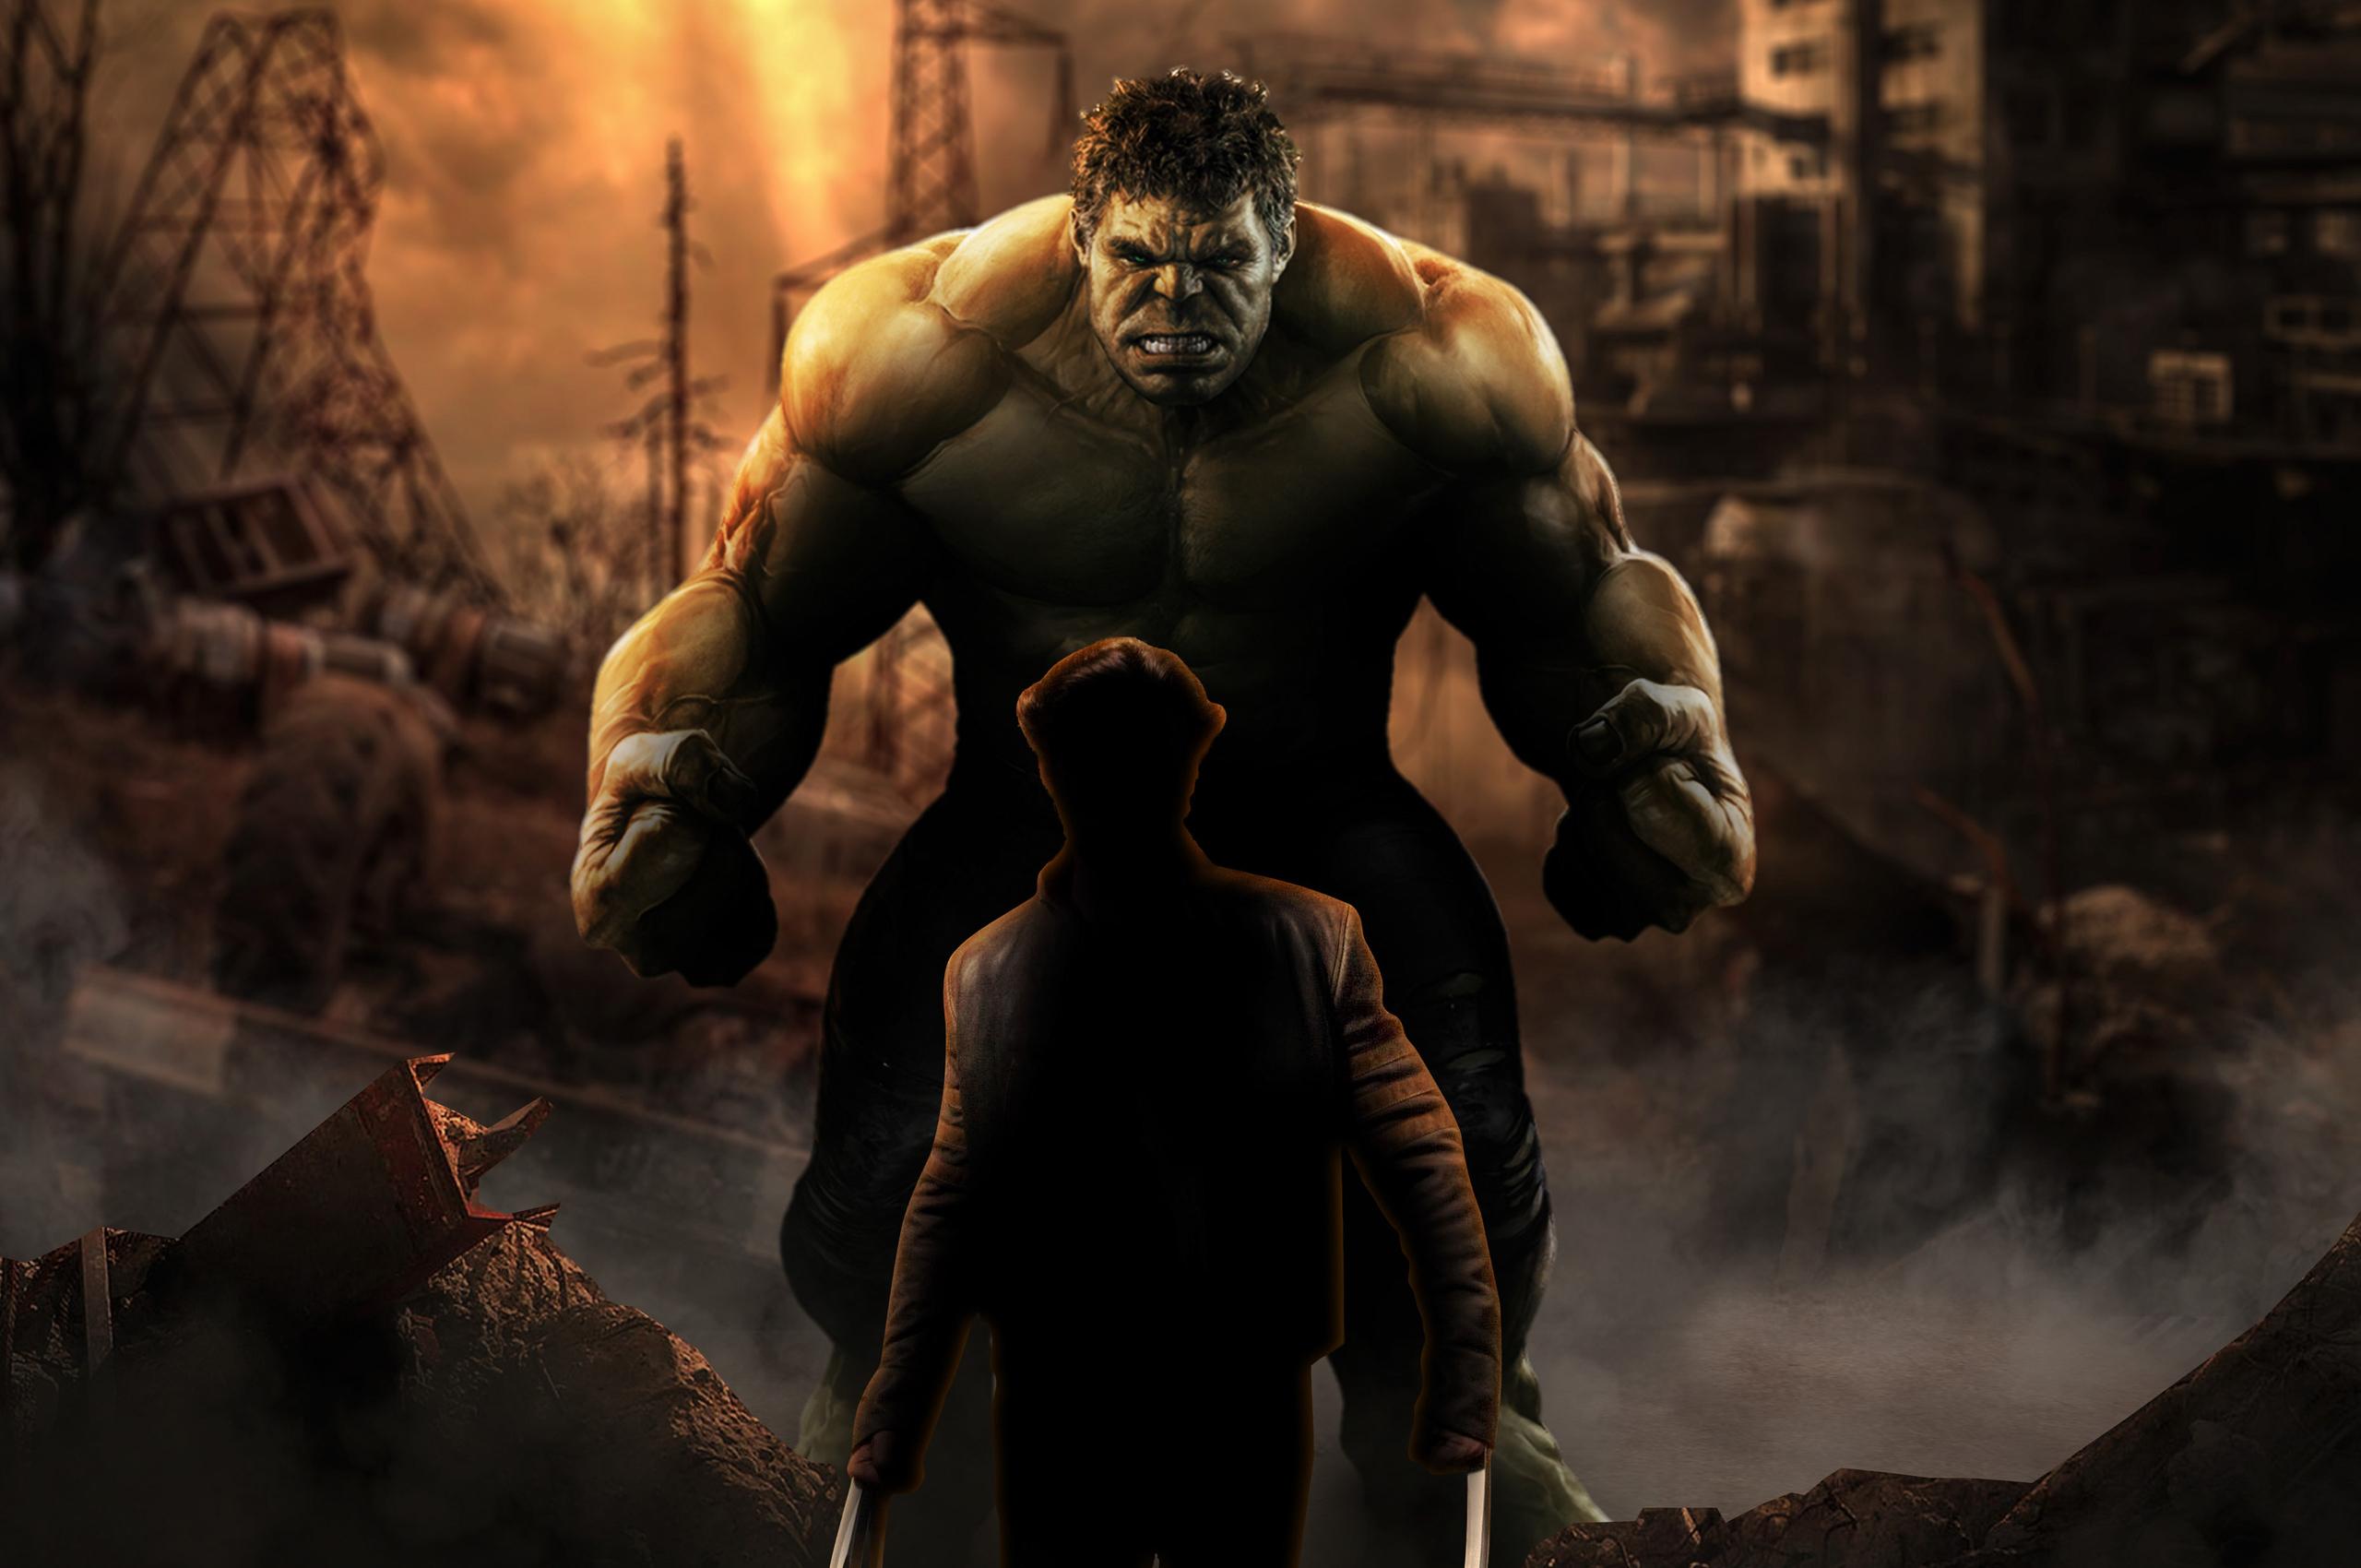 hulk-vs-wolverine-4k-art-zx.jpg